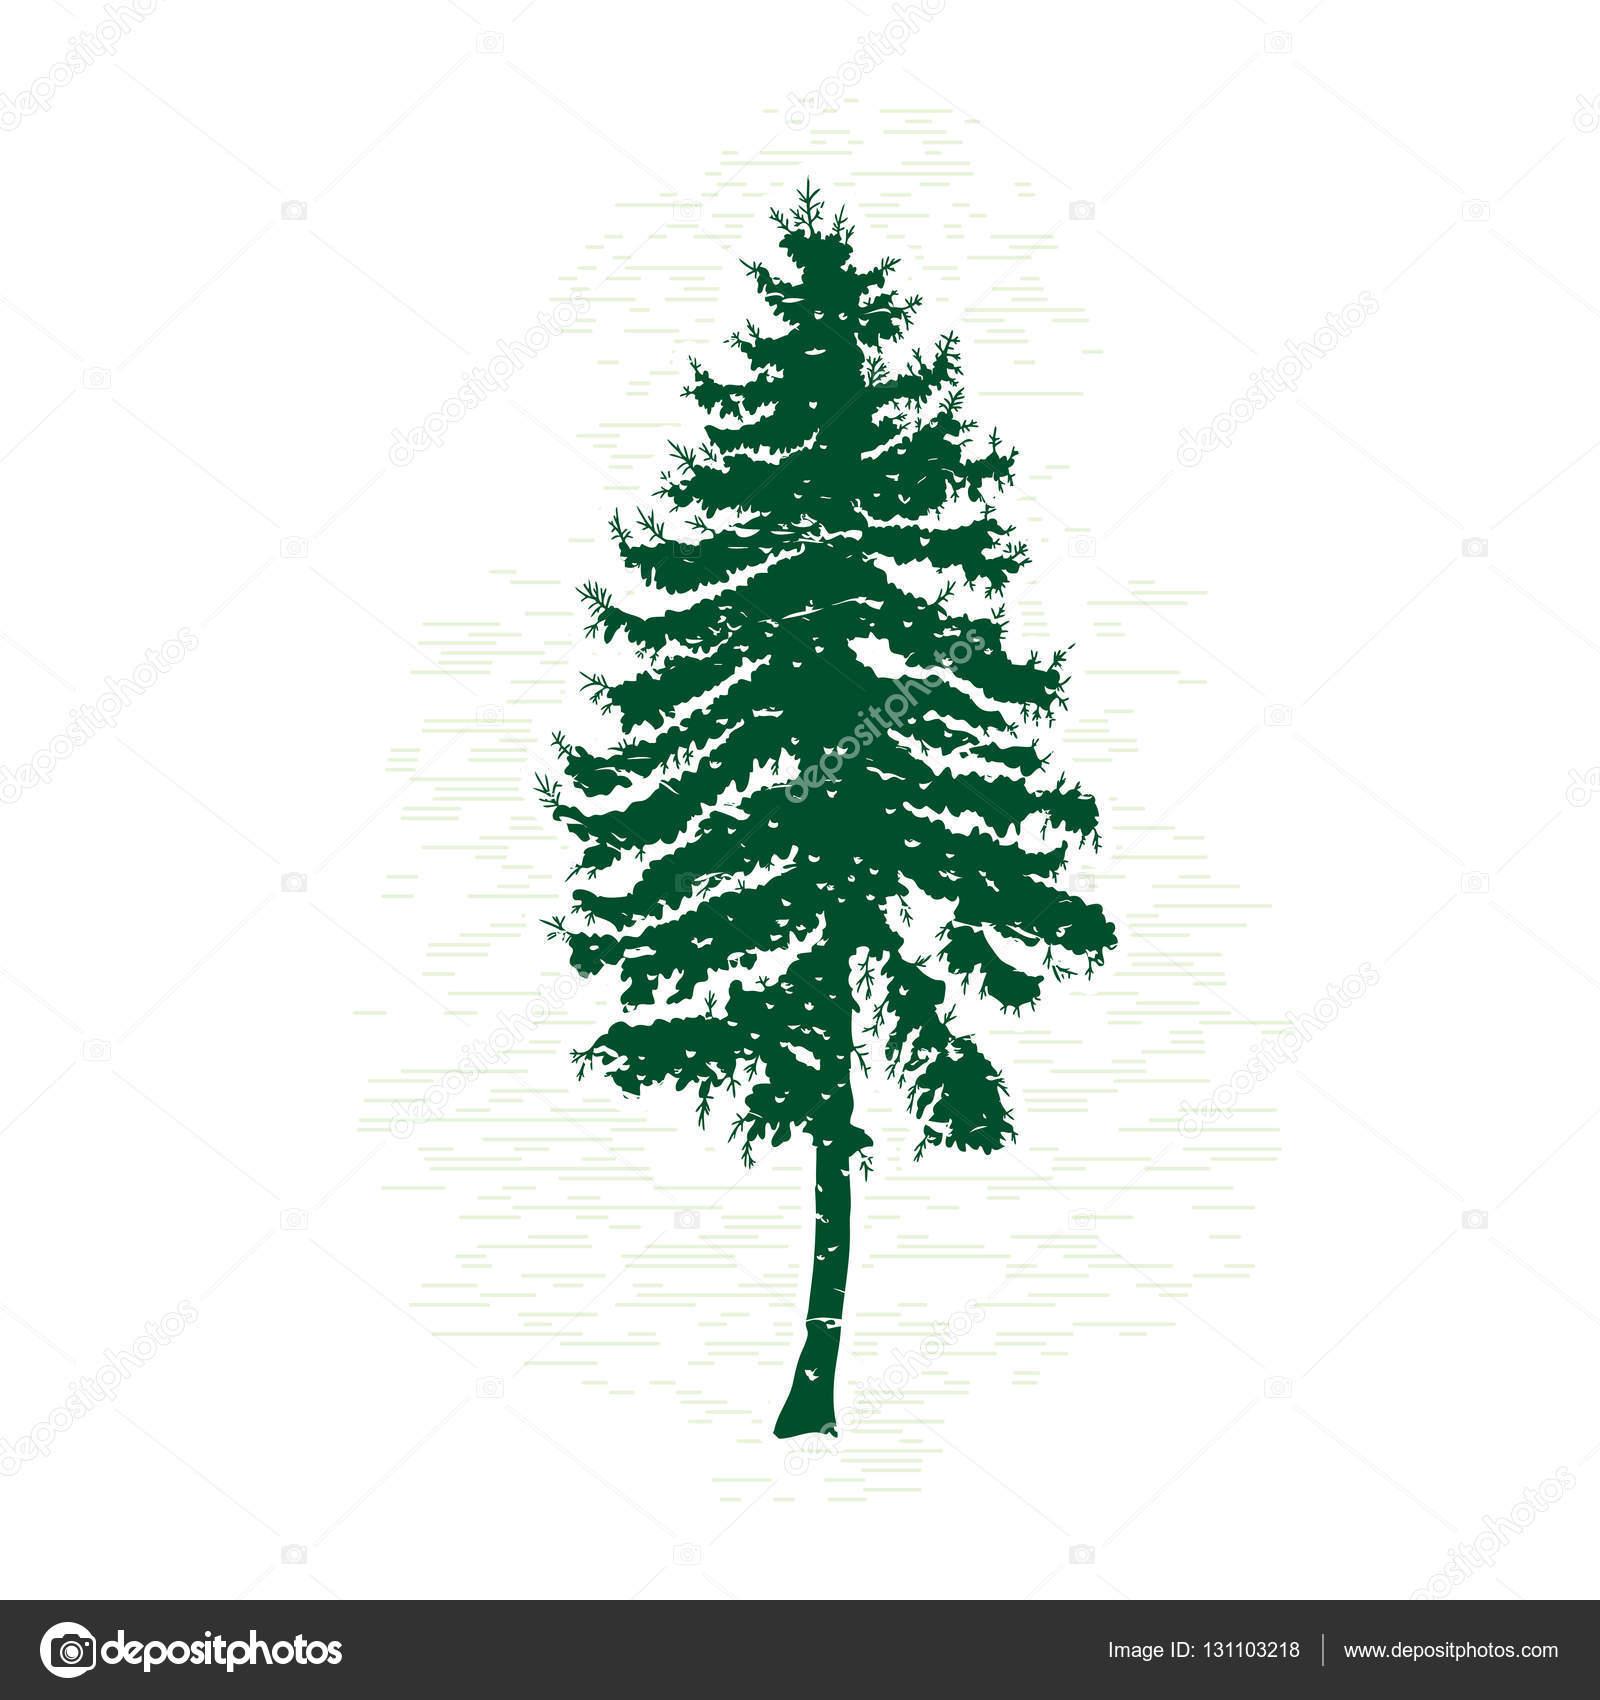 silueta de árbol de pino — Fotos de Stock © goldenshrimp #131103218